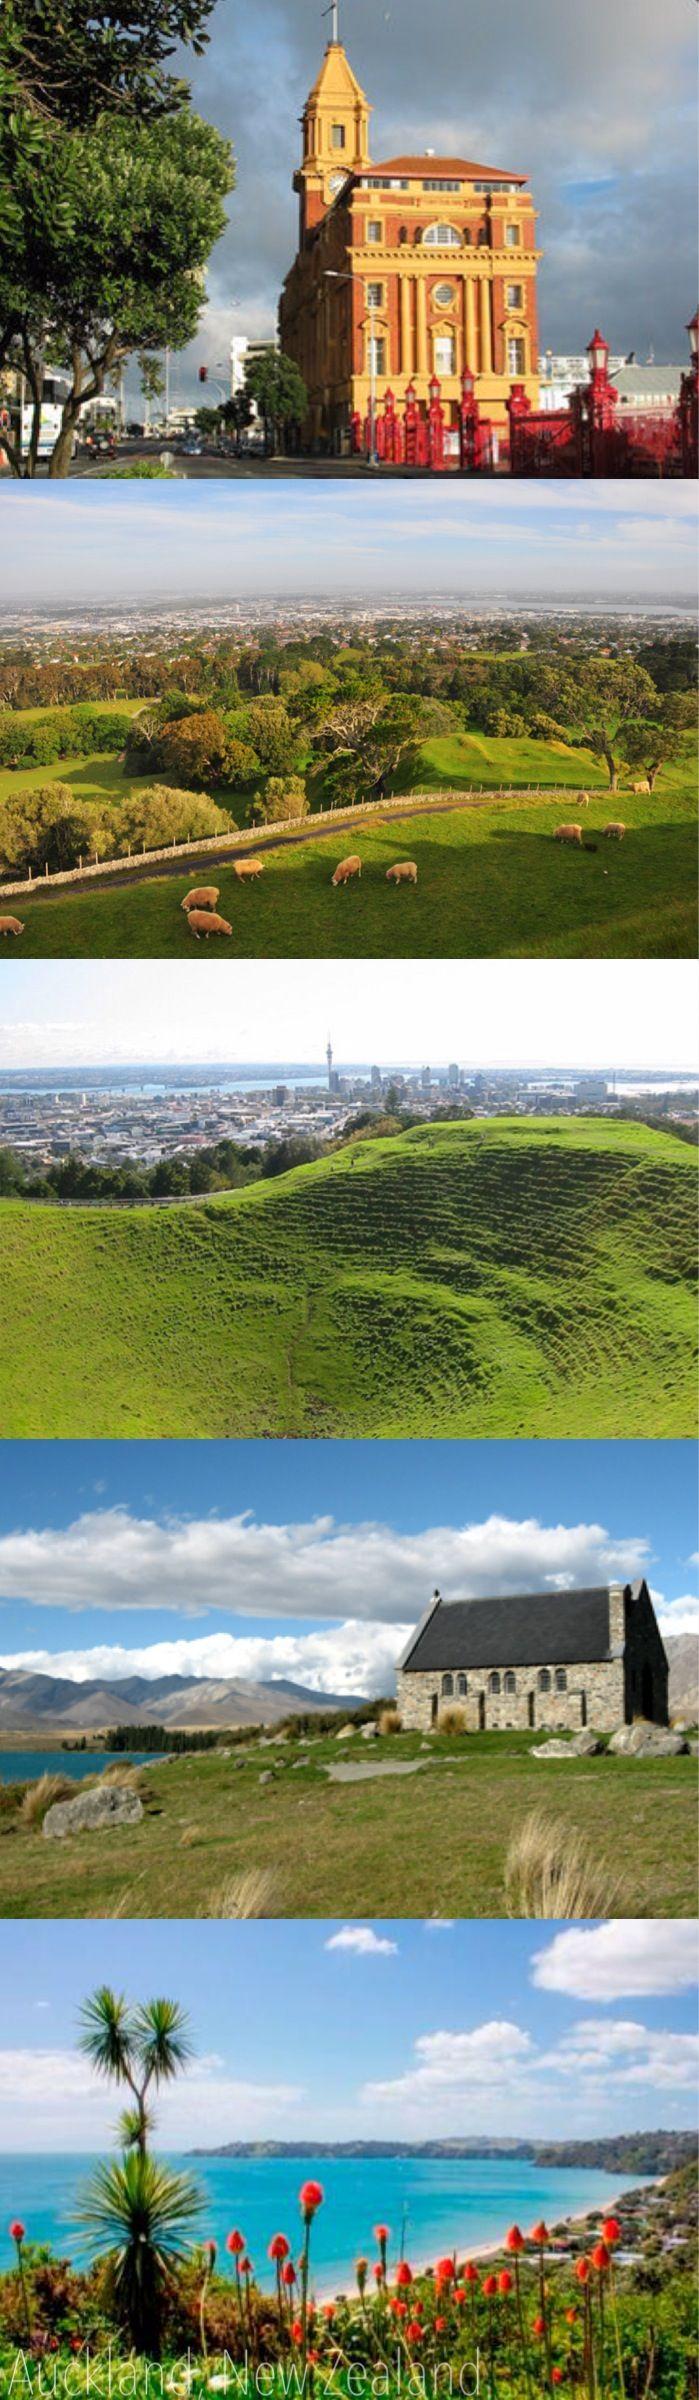 Glimpses of New Zealand...Auckland City, North Island  & Church Of Good Shepard, Lake Tekapo, South Island